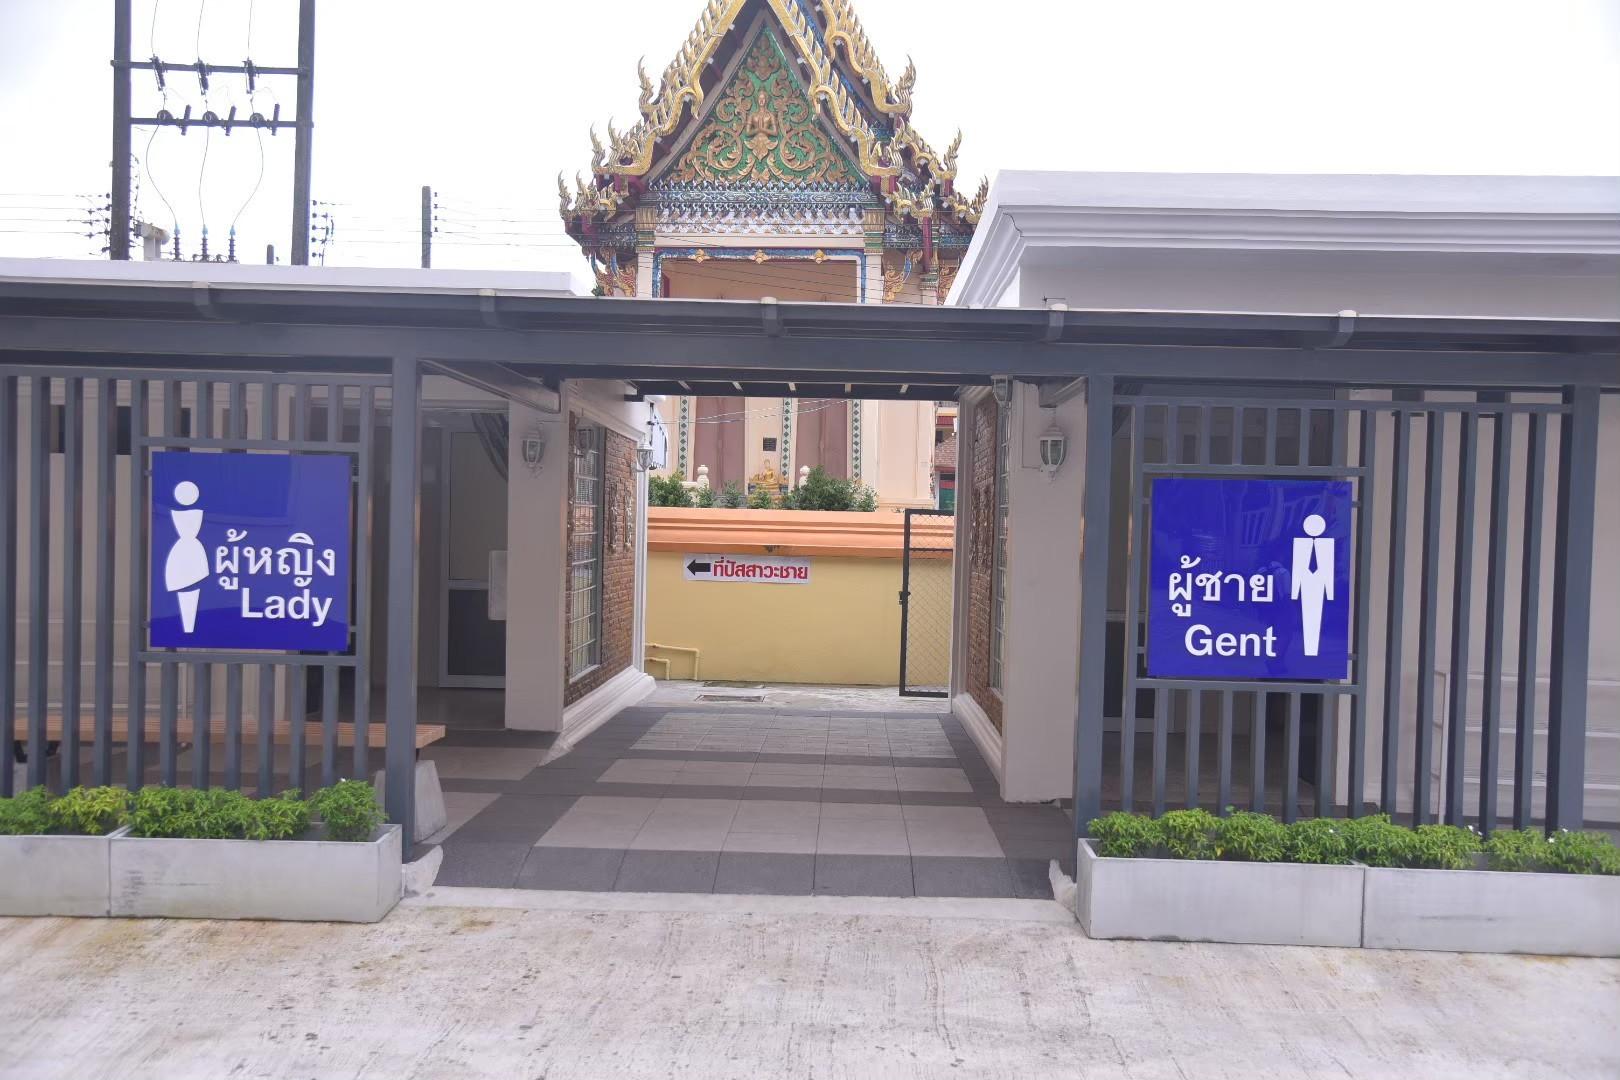 Universal Design เข้าถึงง่าย ไปได้ทุกที่ thaihealth